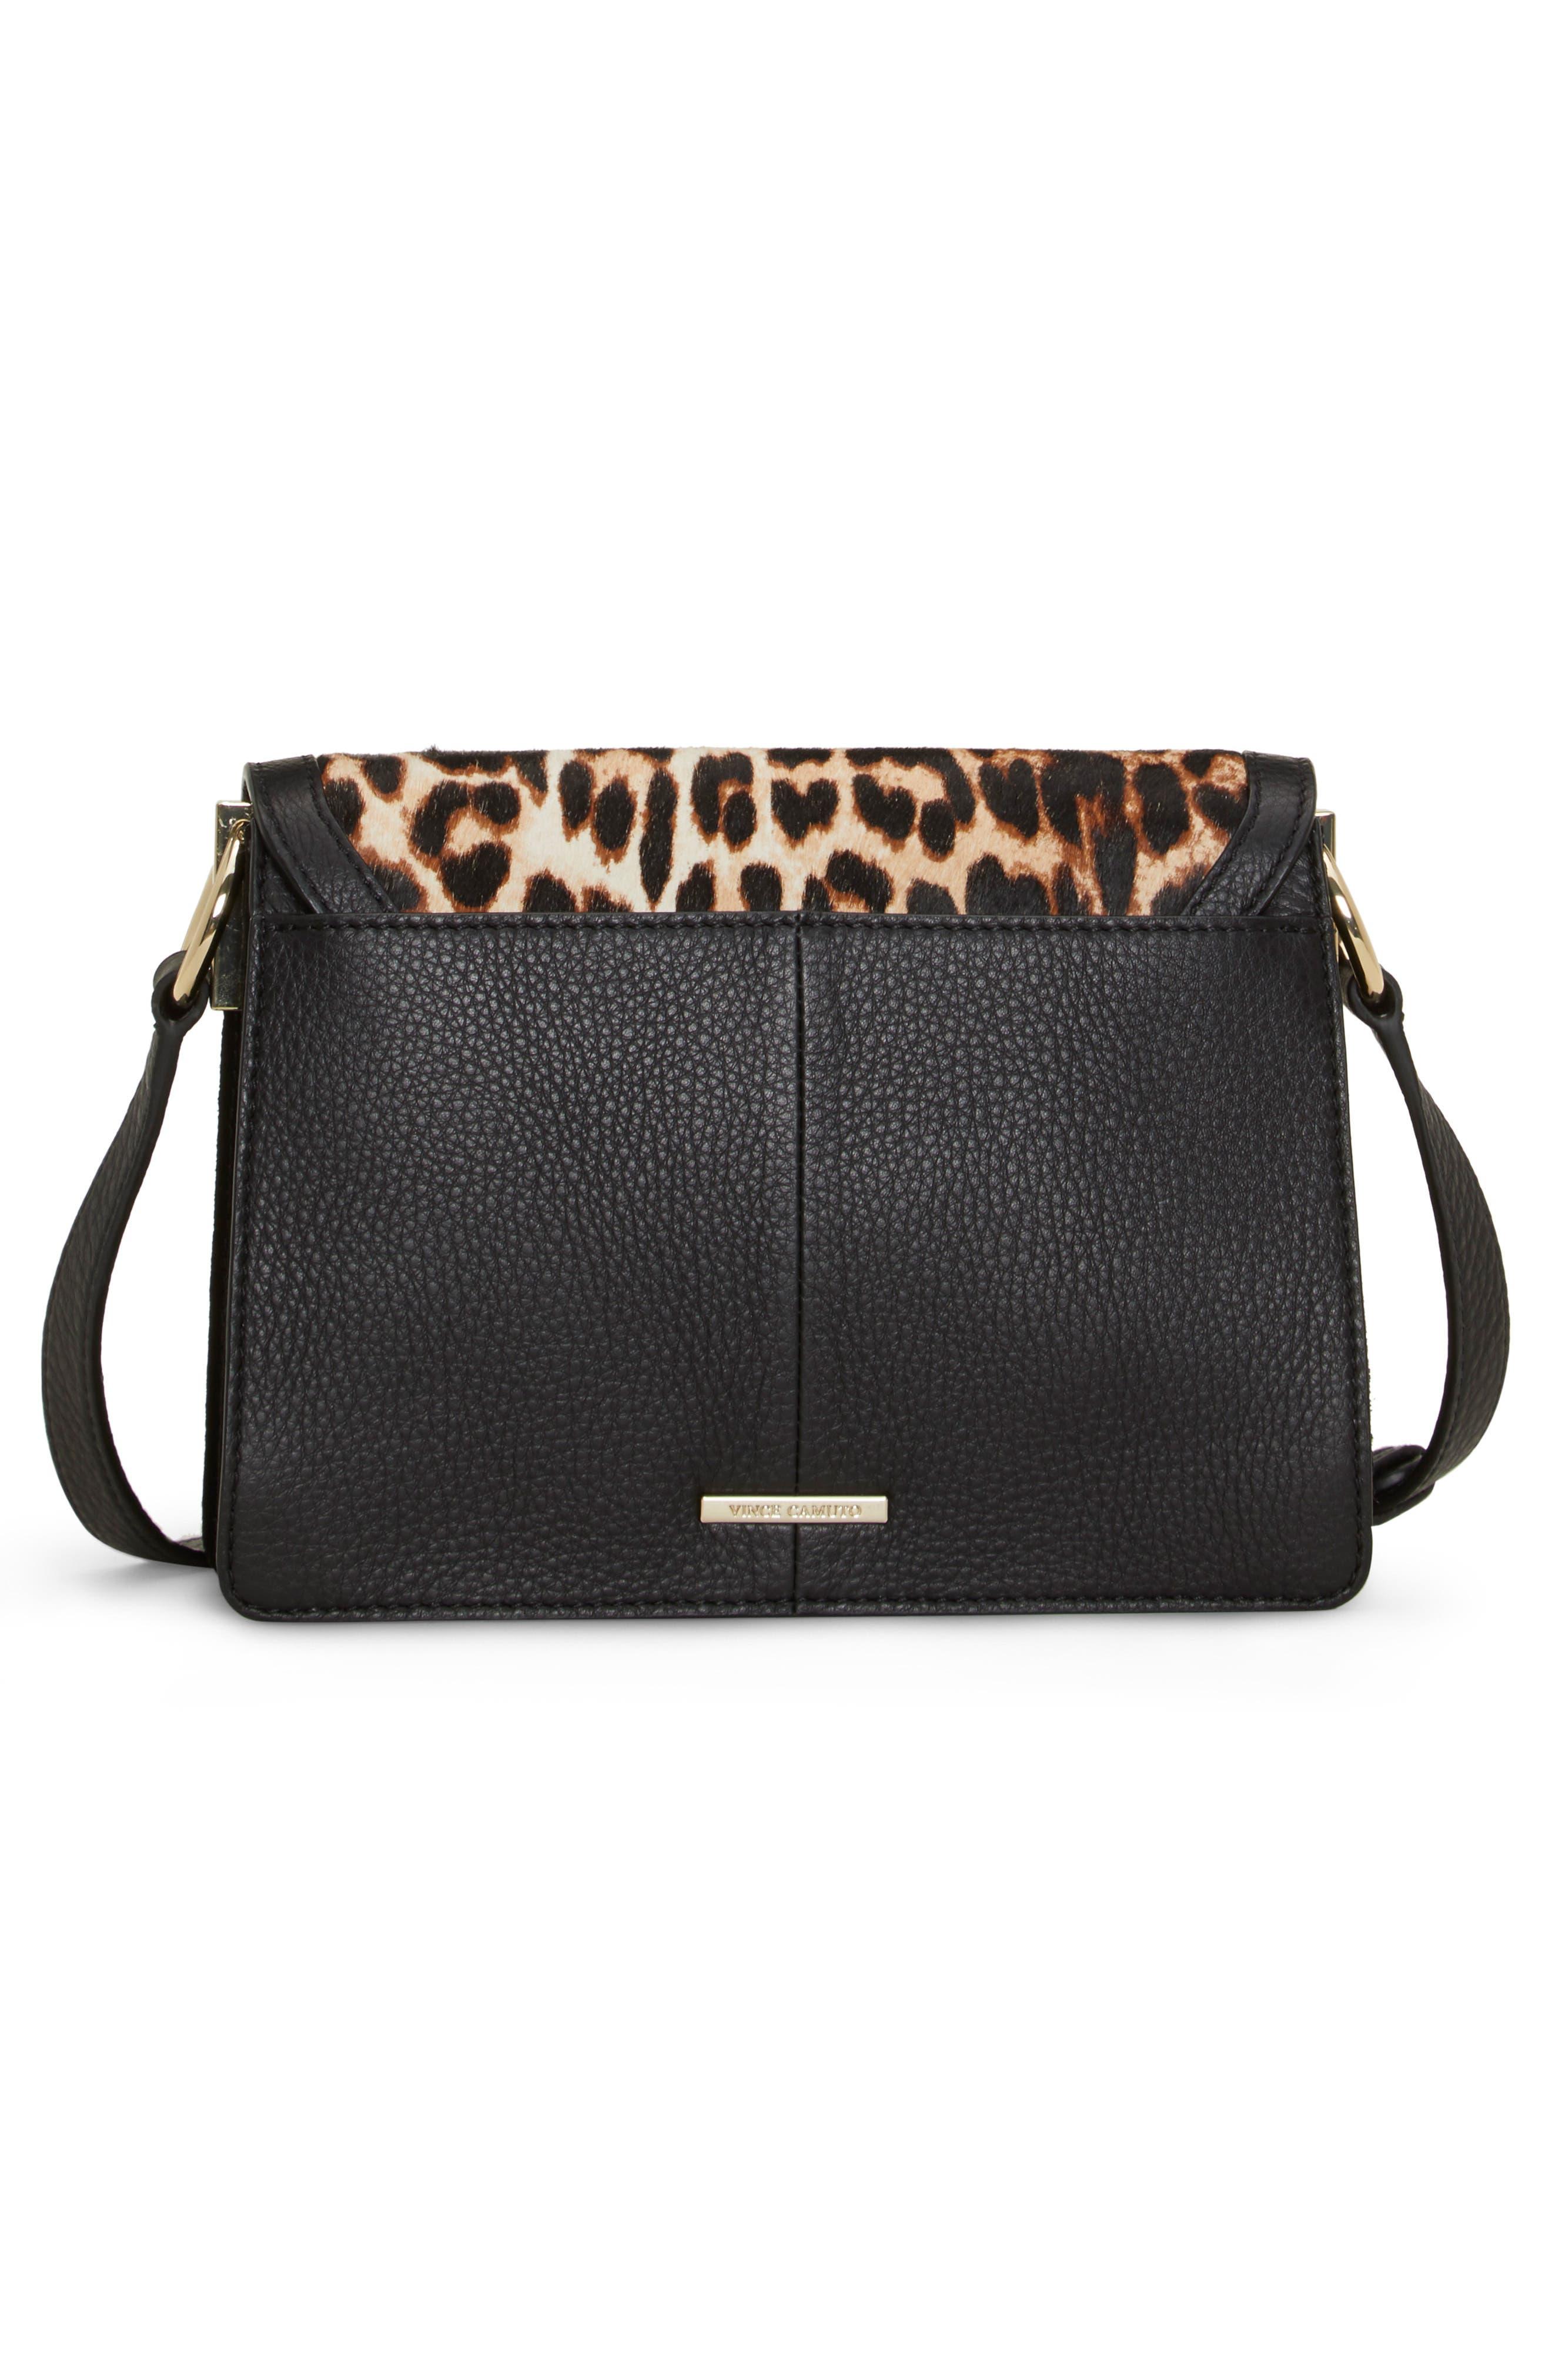 Kirisi Leather & Genuine Calf Hair Crossbody Bag,                             Alternate thumbnail 2, color,                             204